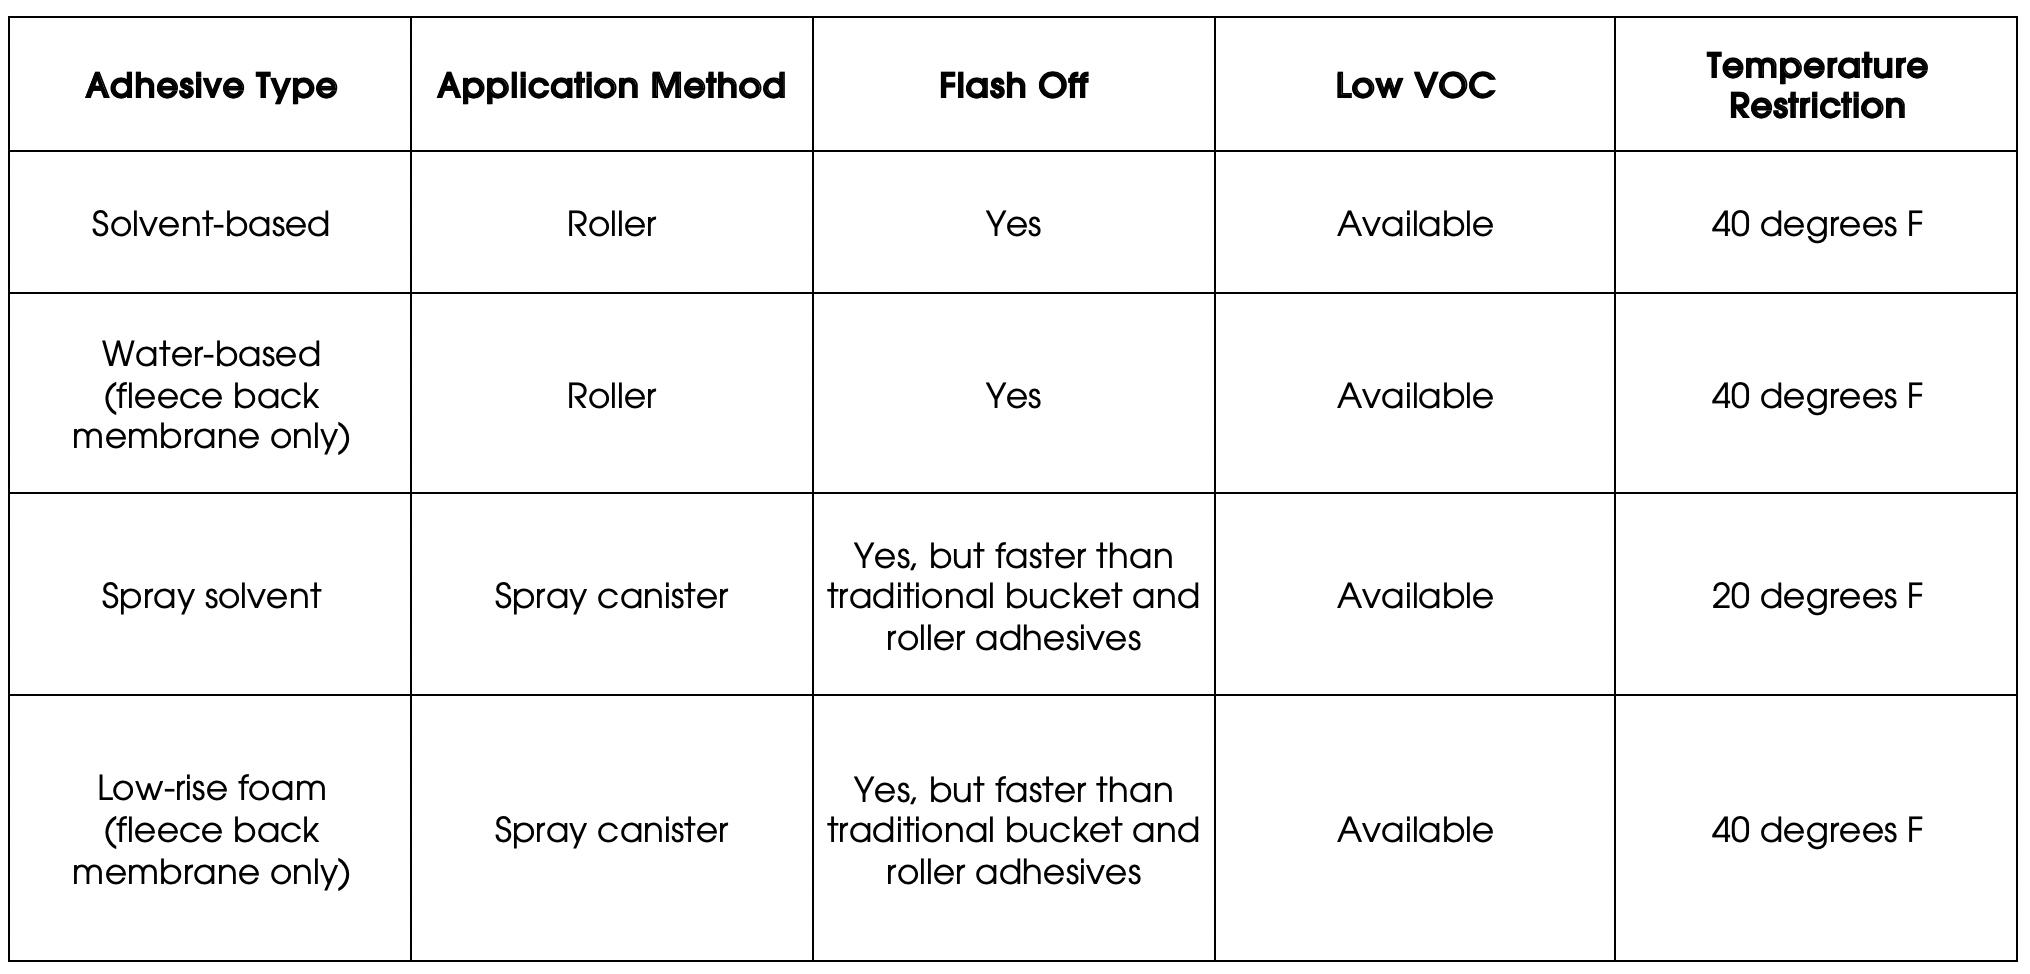 Comparison of Adhesive Type